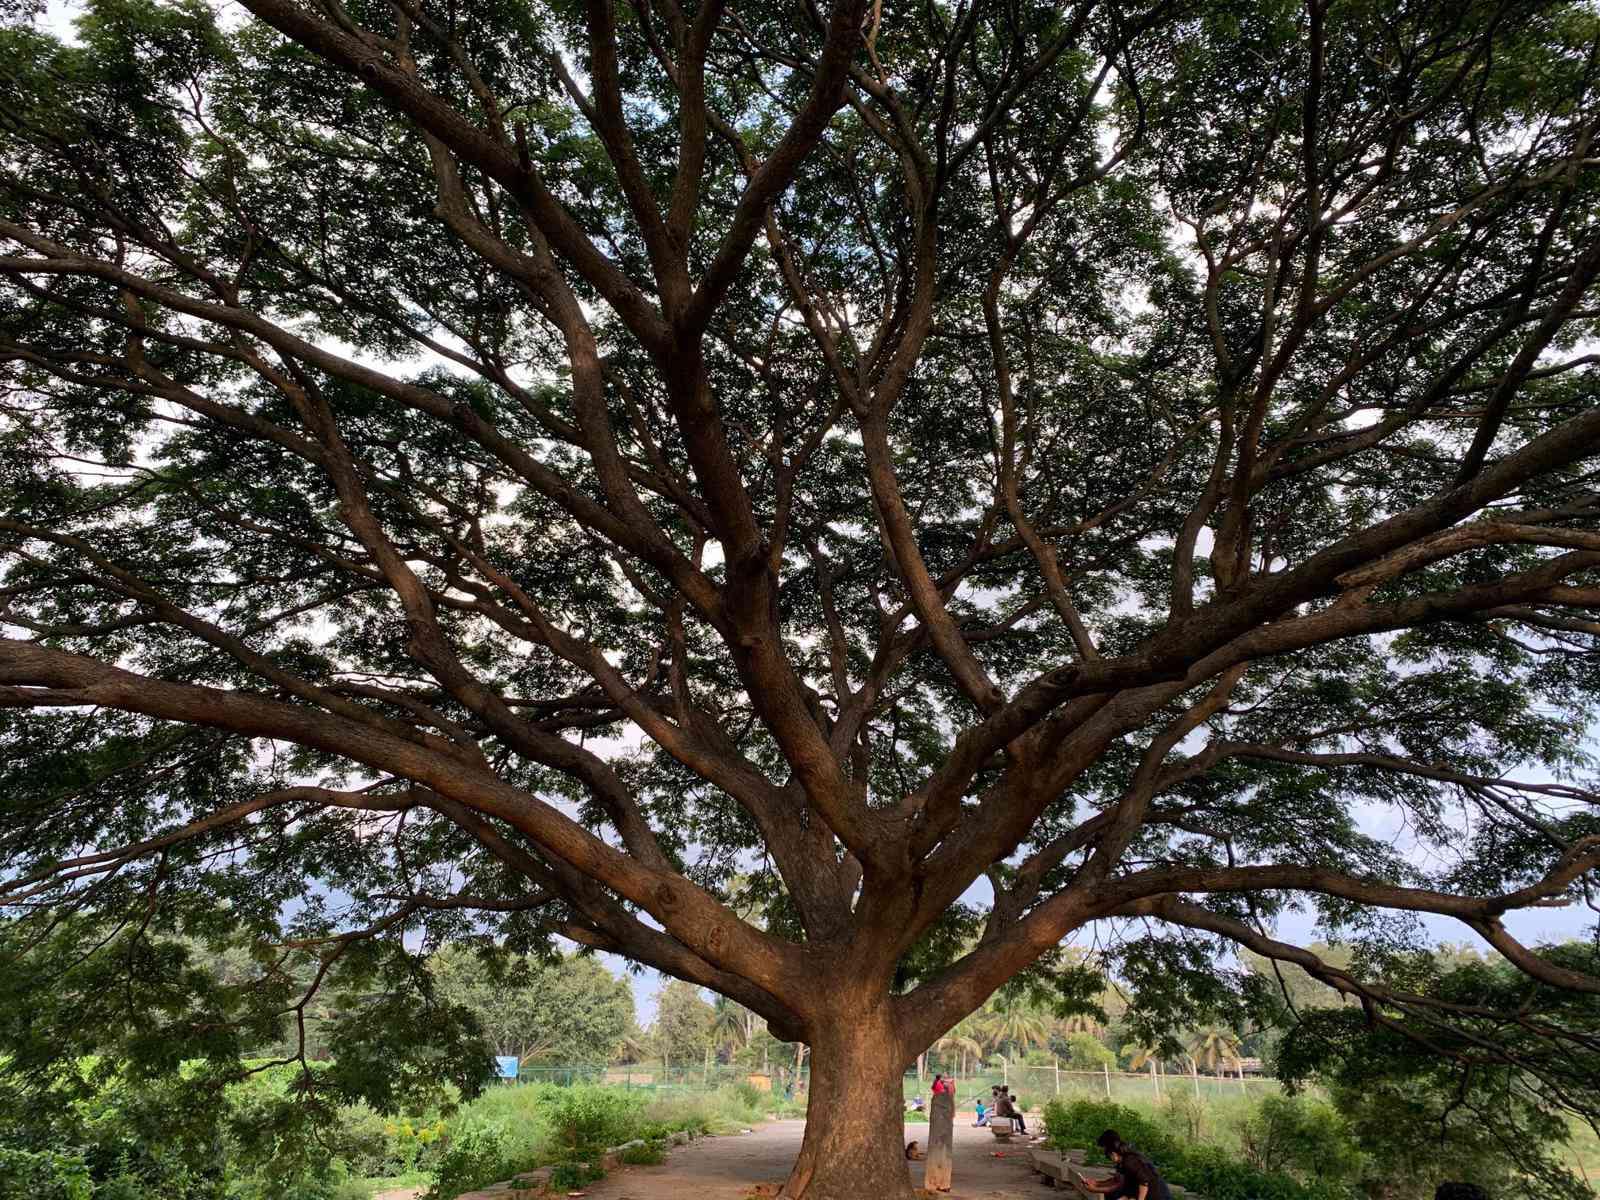 A Tree Gallery: A Visual Novel